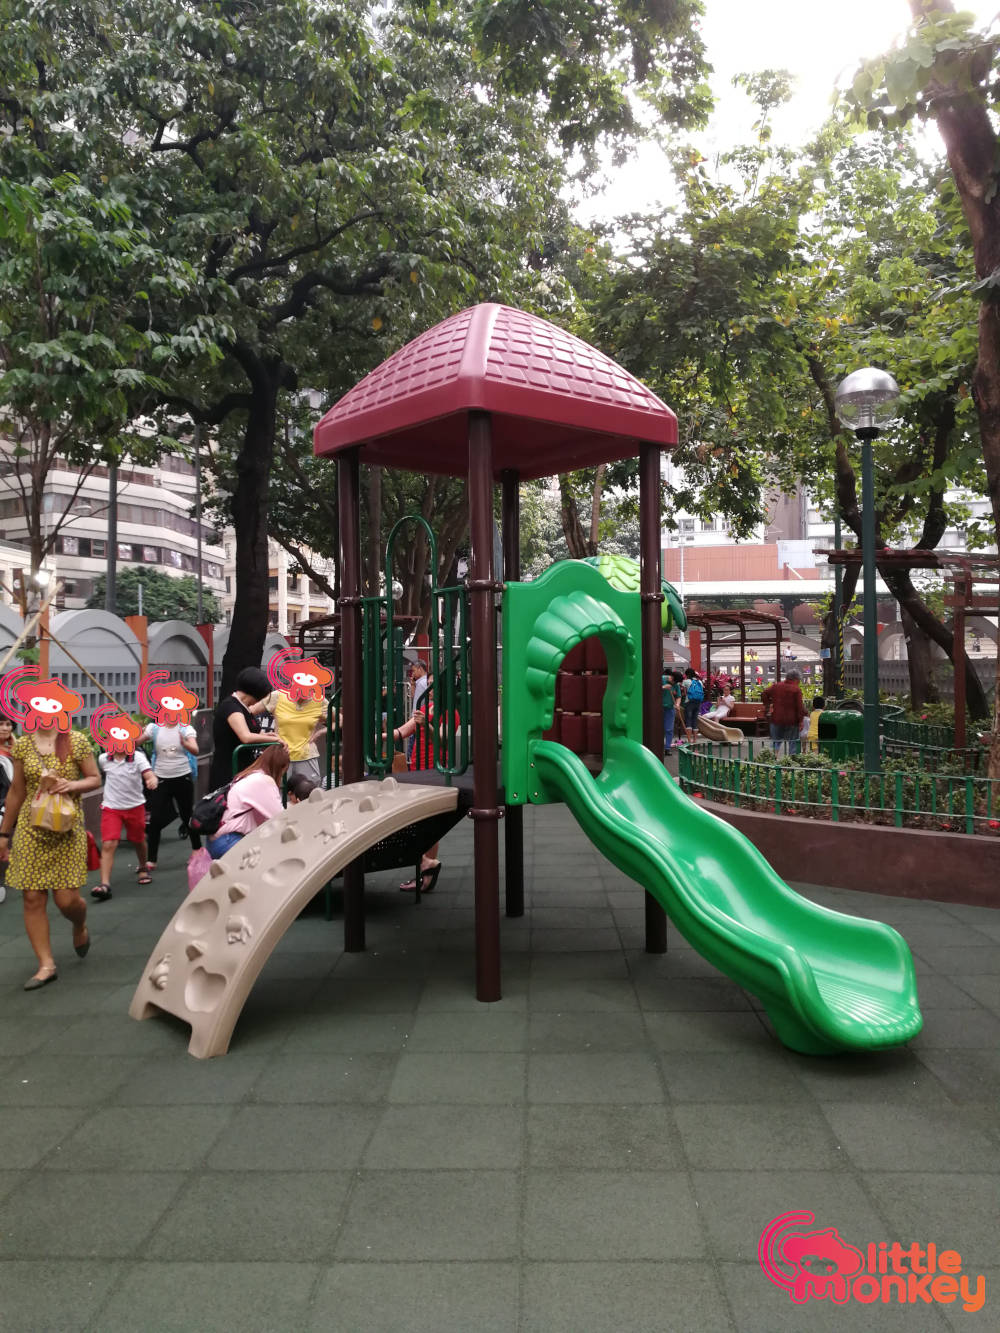 Southorn Playground's slide